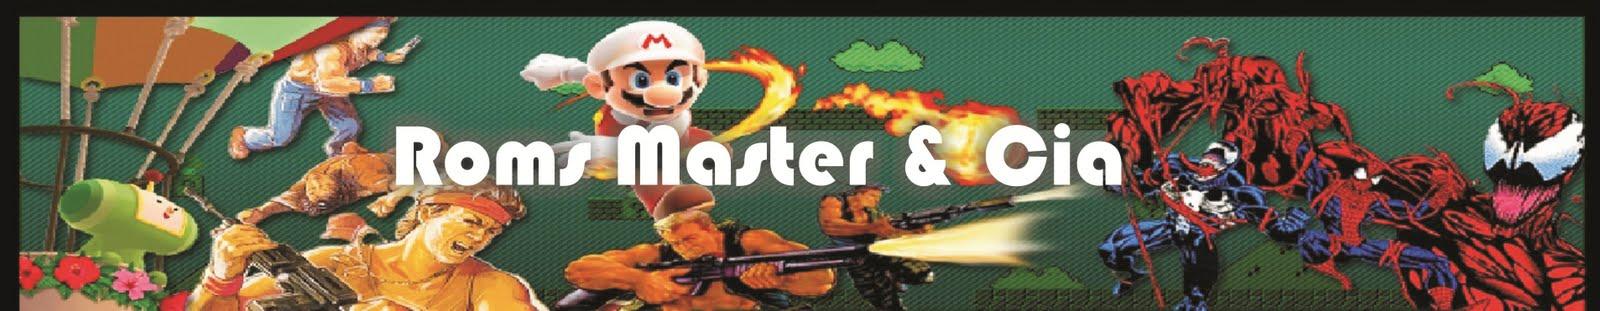 Roms Master & Cia